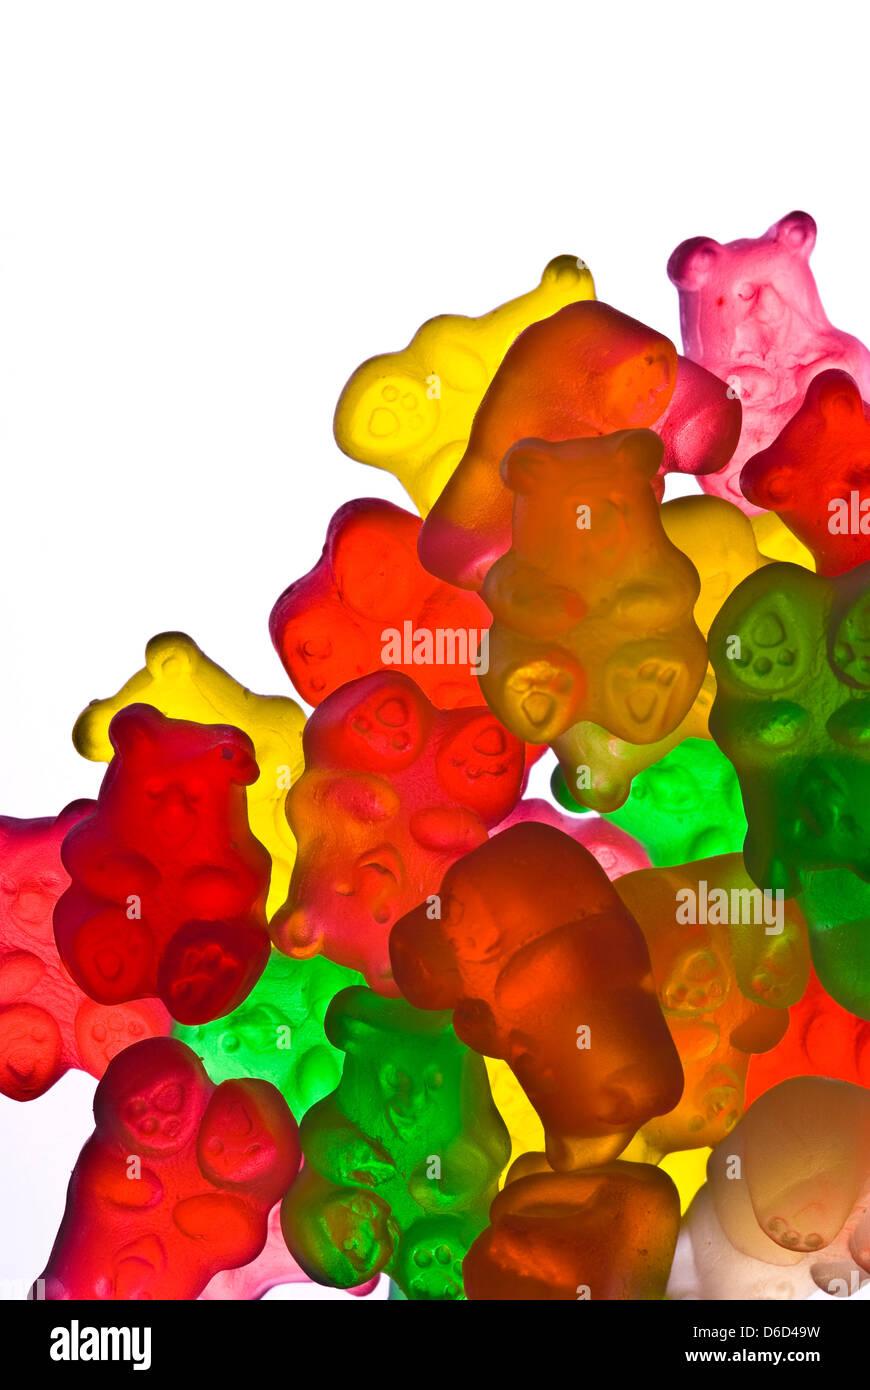 Cannabis Edible Gummy Bears Stock Photo